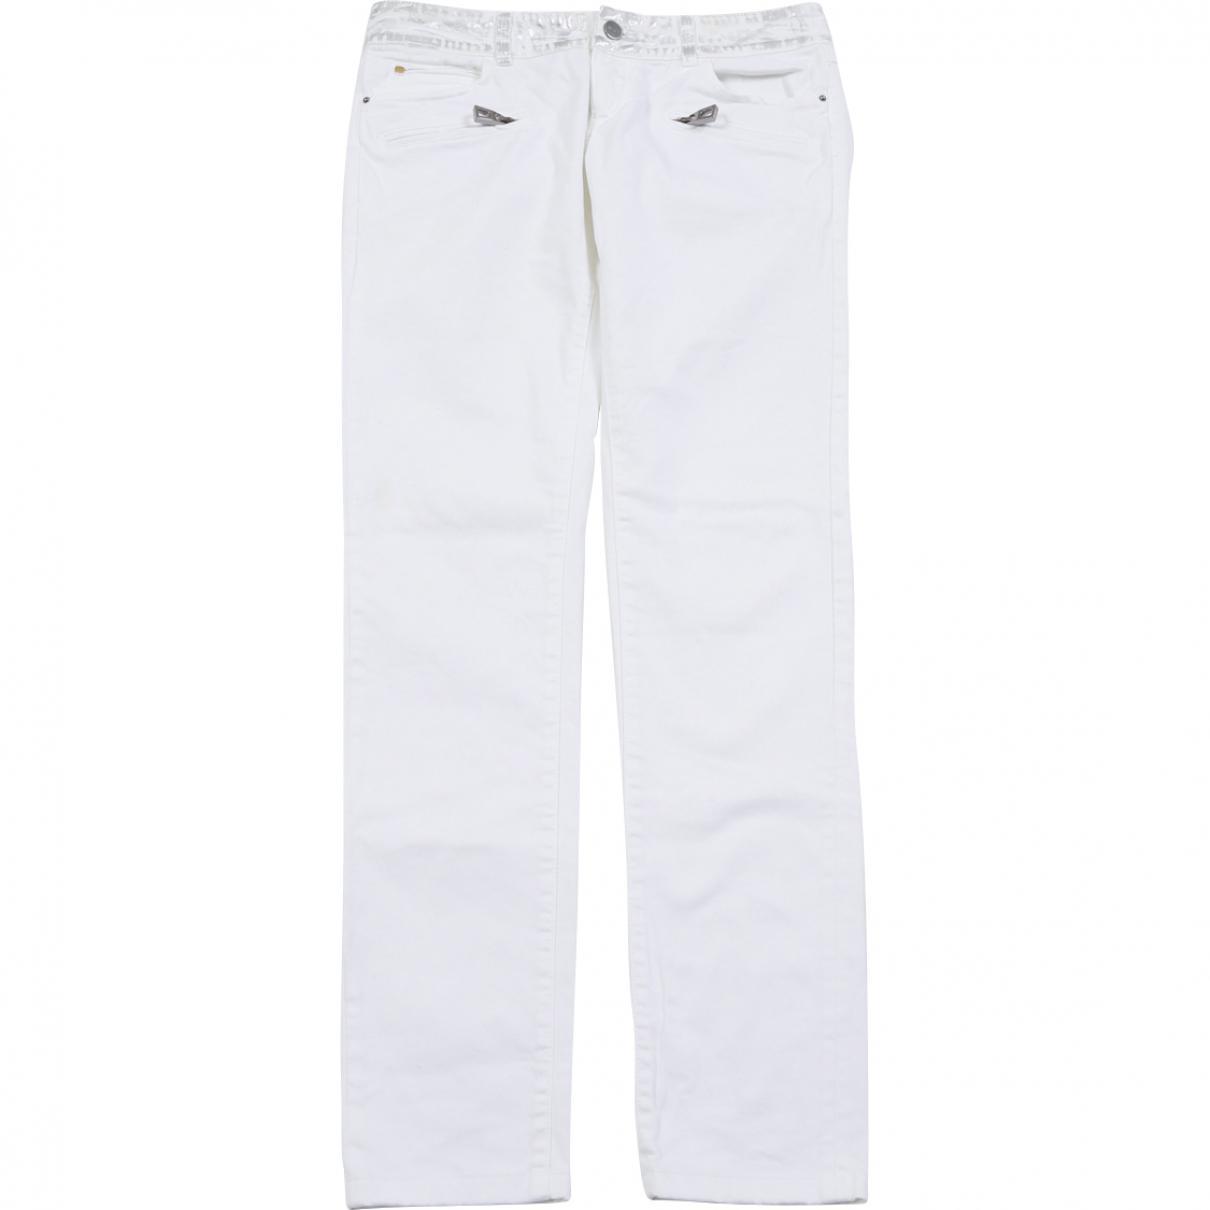 d217fdf68 Bui White Men Slim For Barbara In Lyst Jeans SqwFTpw8